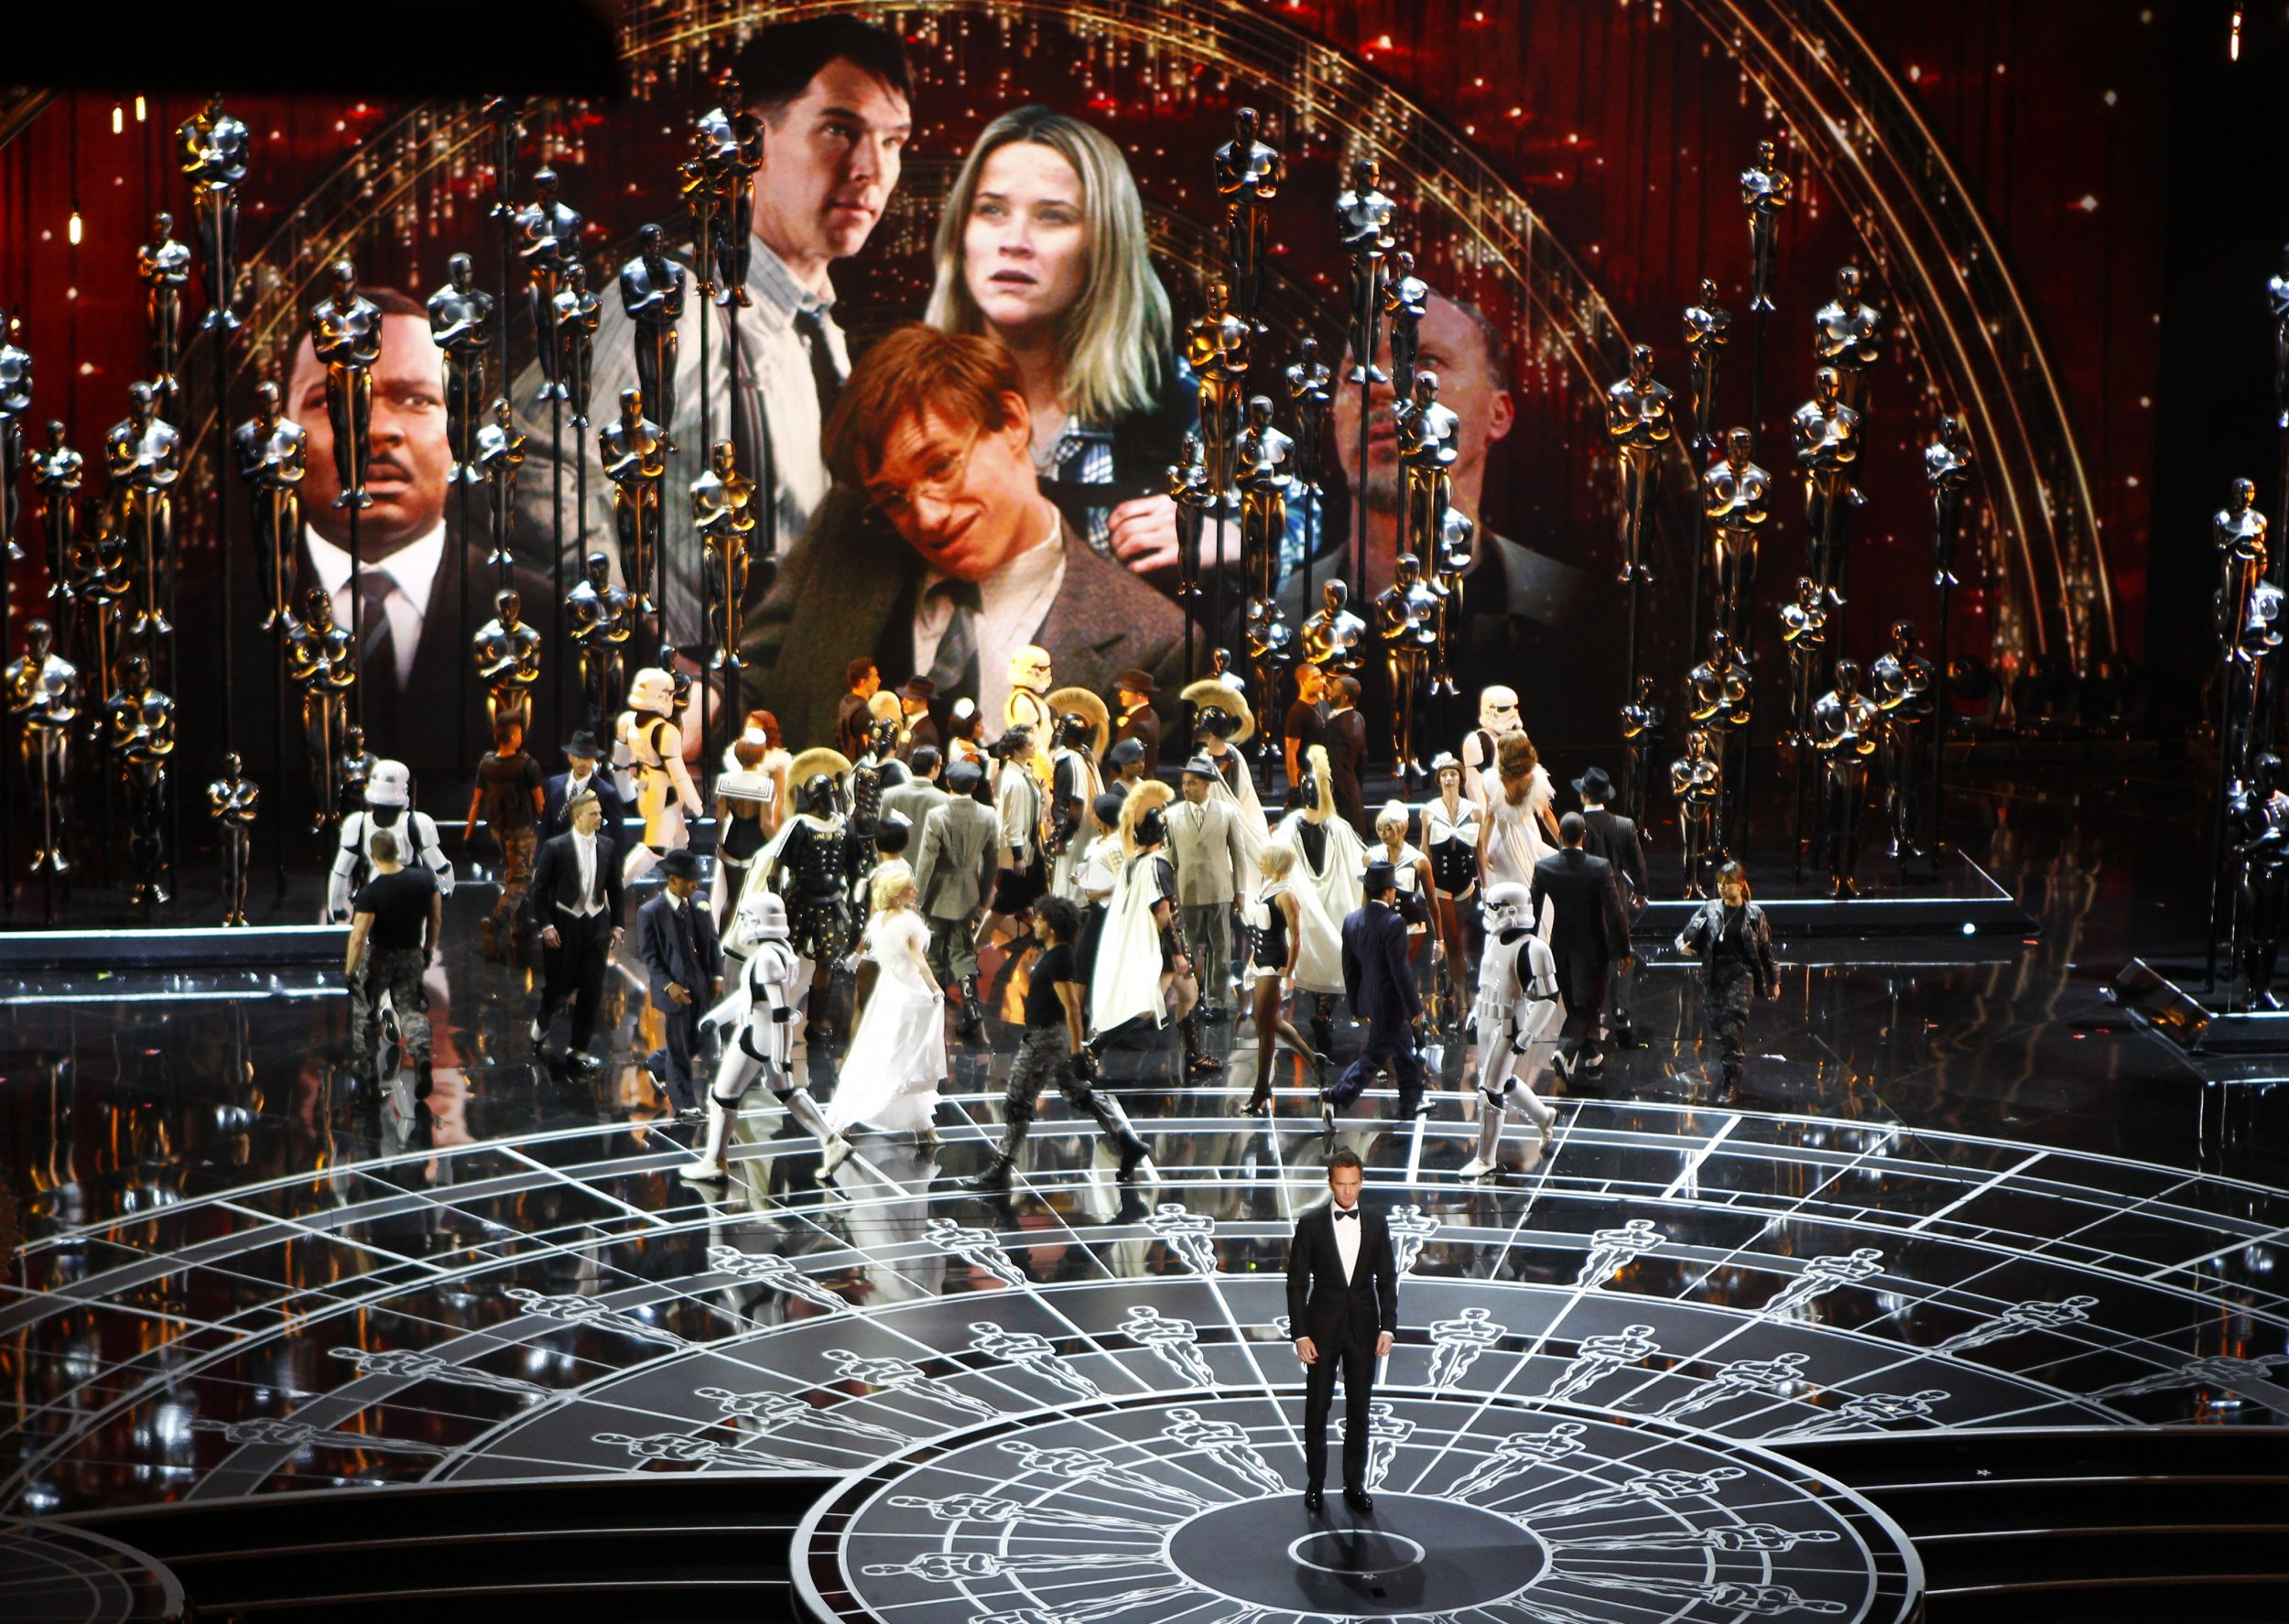 Neil Patrick Harris hosts Academy Awards 2015